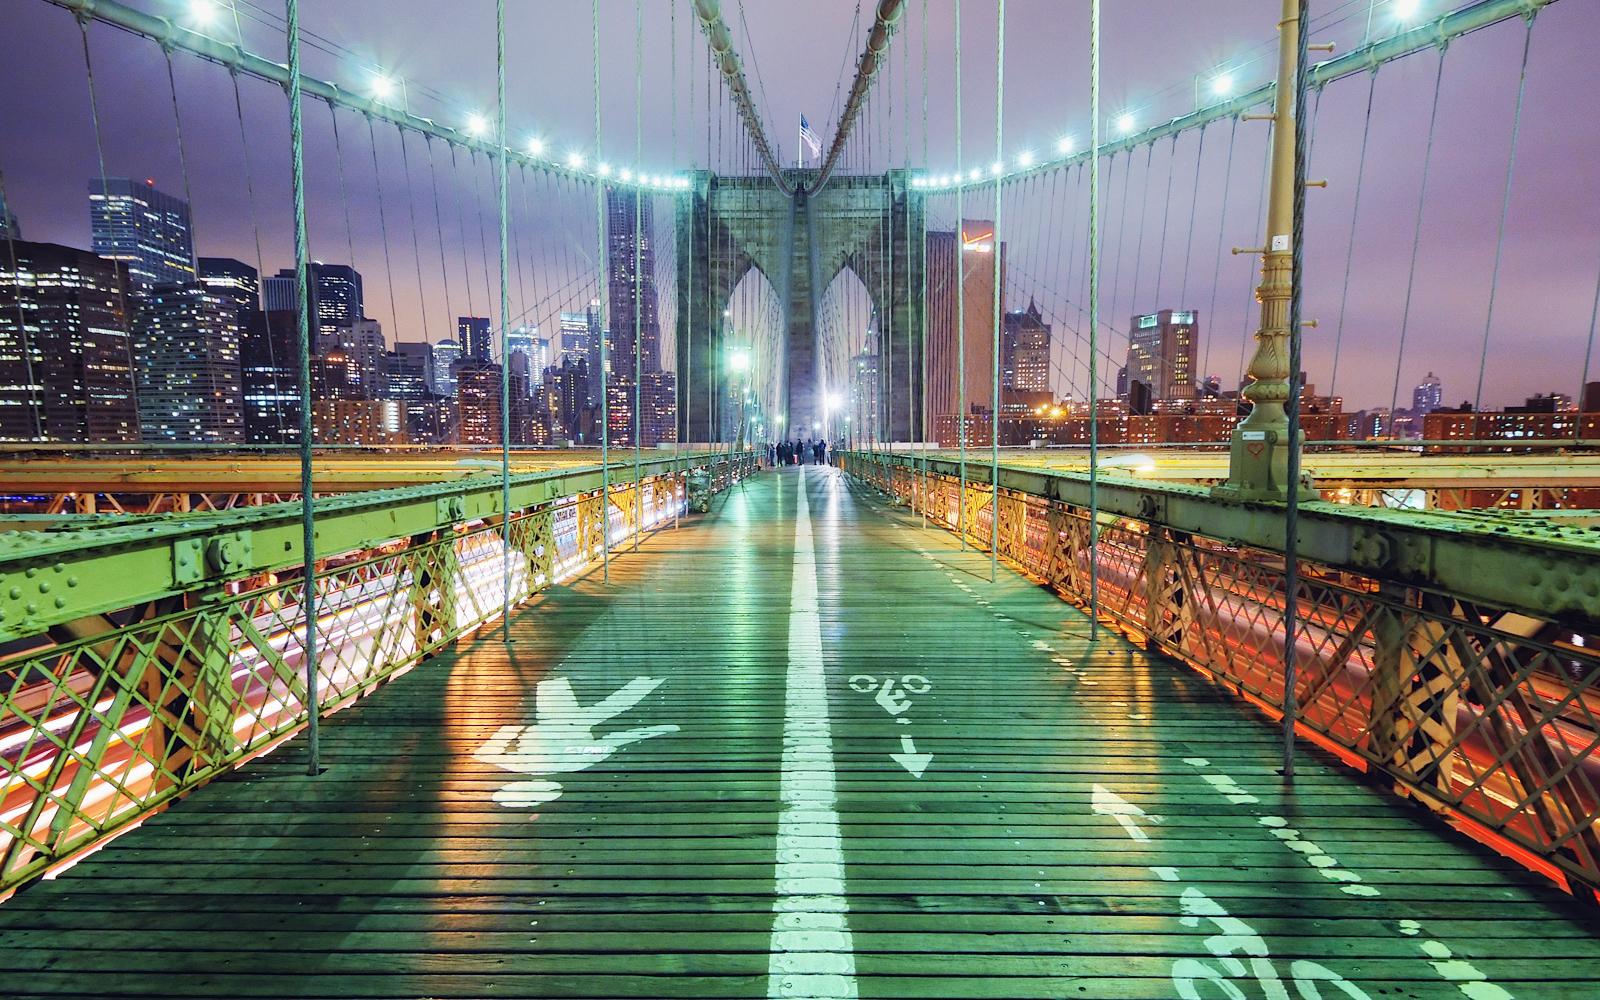 Download Wallpaper Night Brooklyn Bridge - c3d26eb2ffed7e18faeb8a4a62e0b026  Graphic.jpg